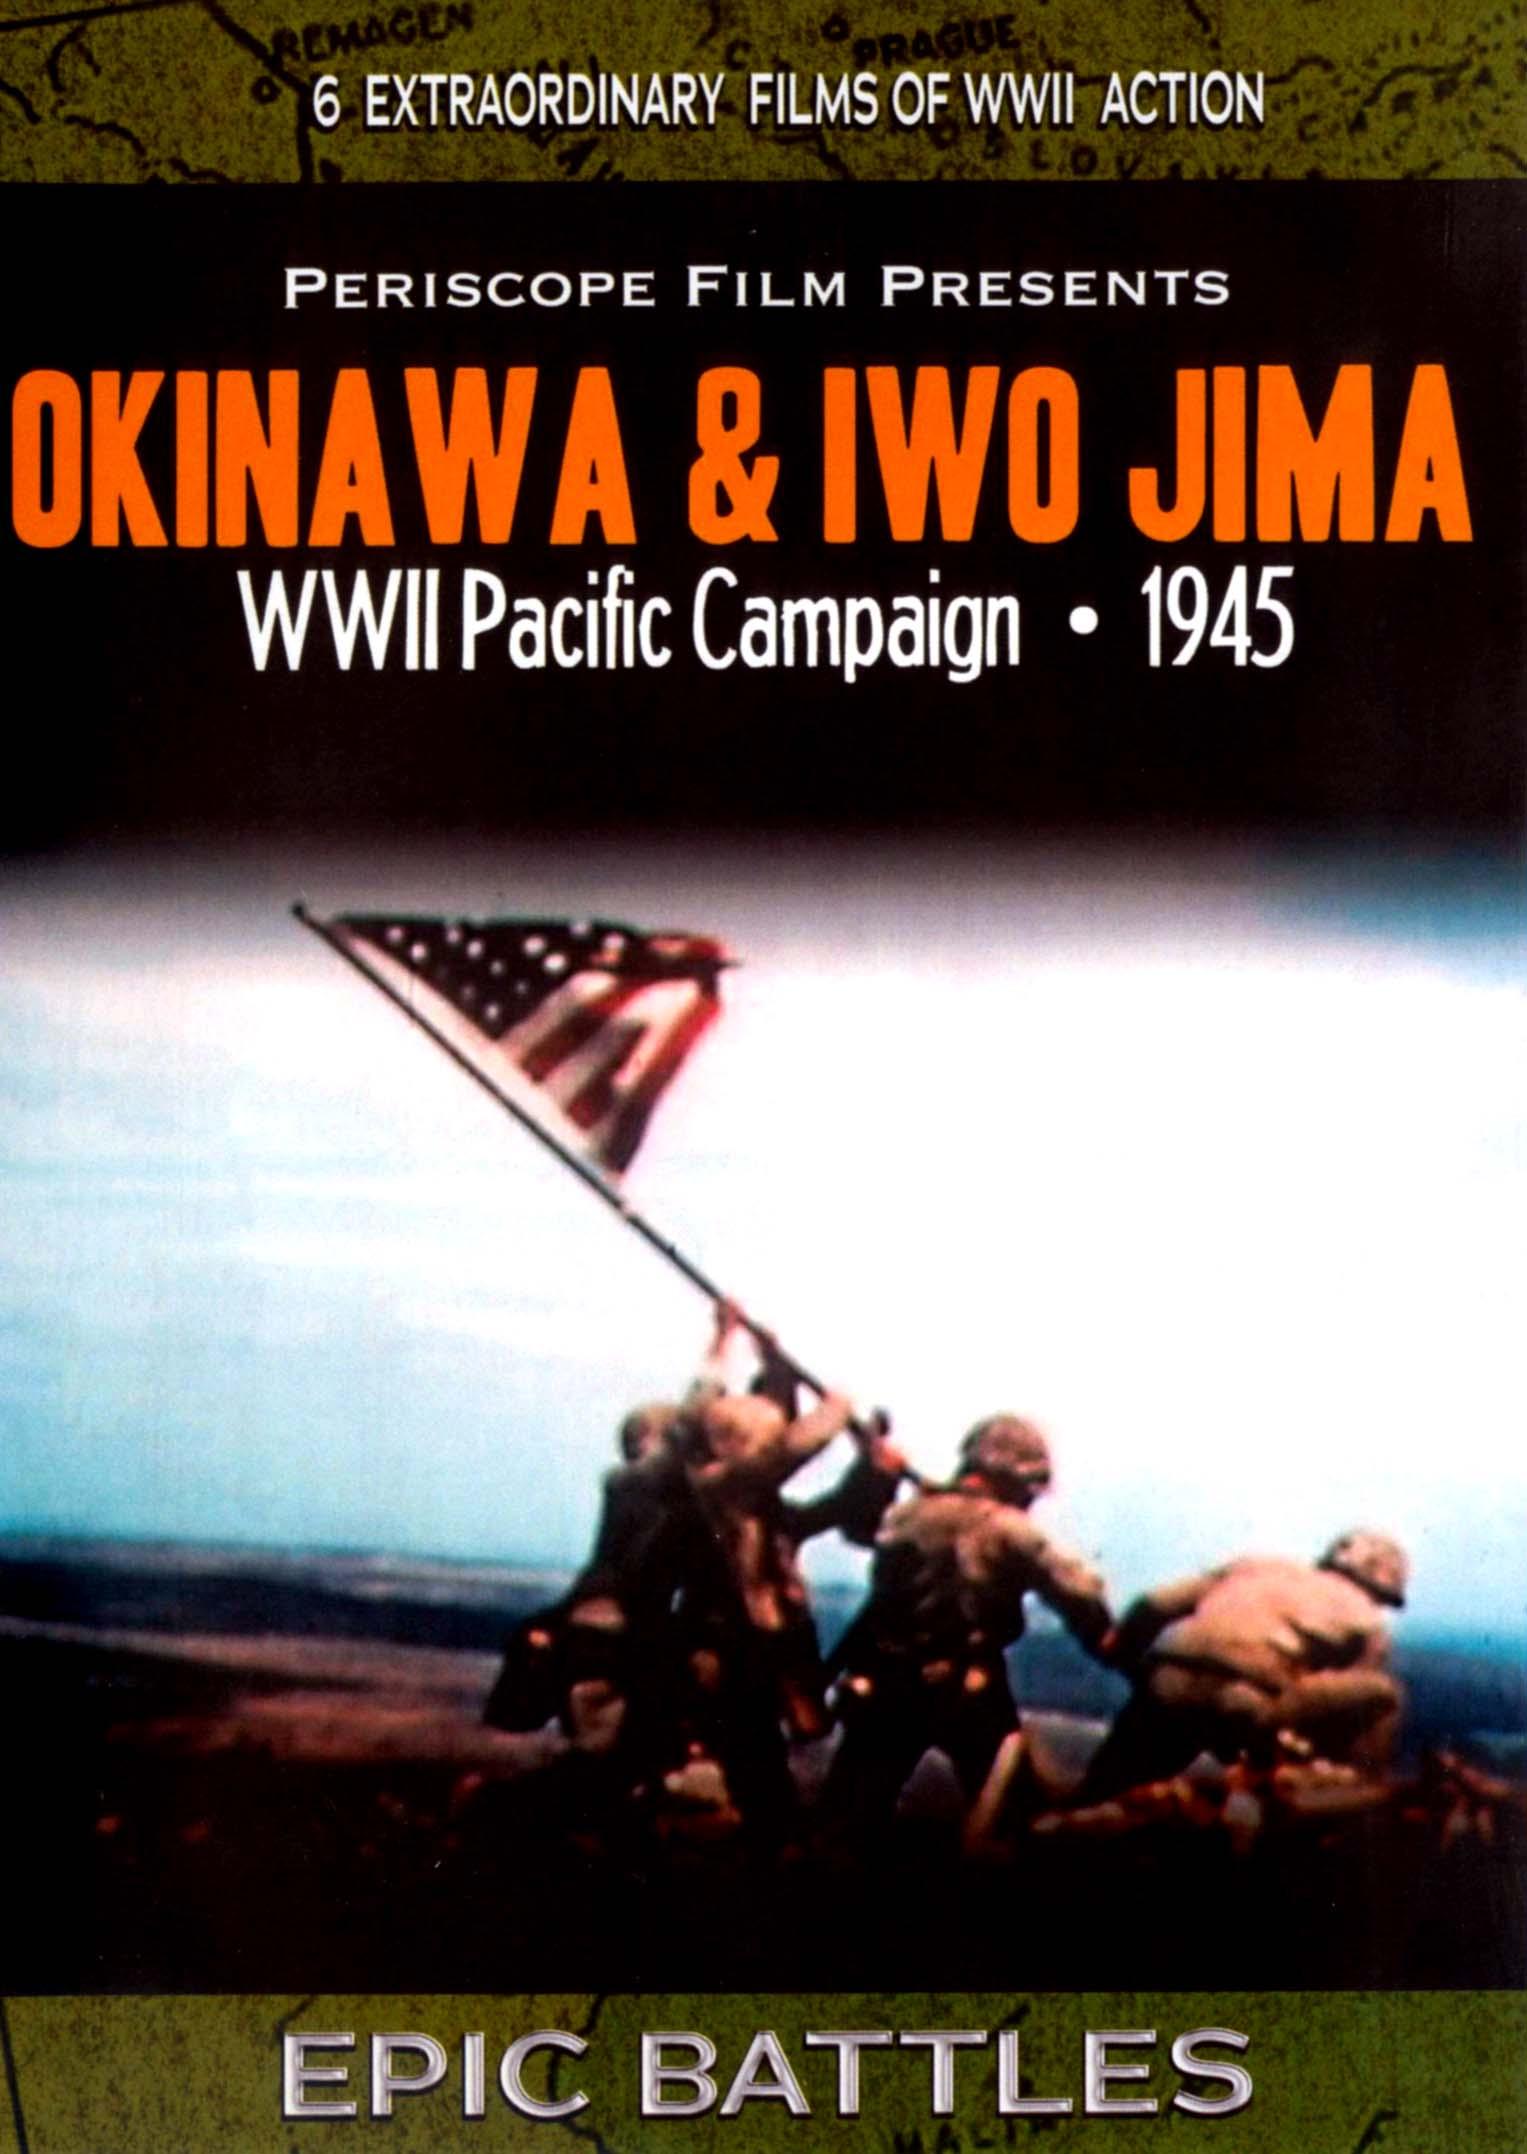 Okinawa & Iwojima: WWII Pacific Campaign 1945